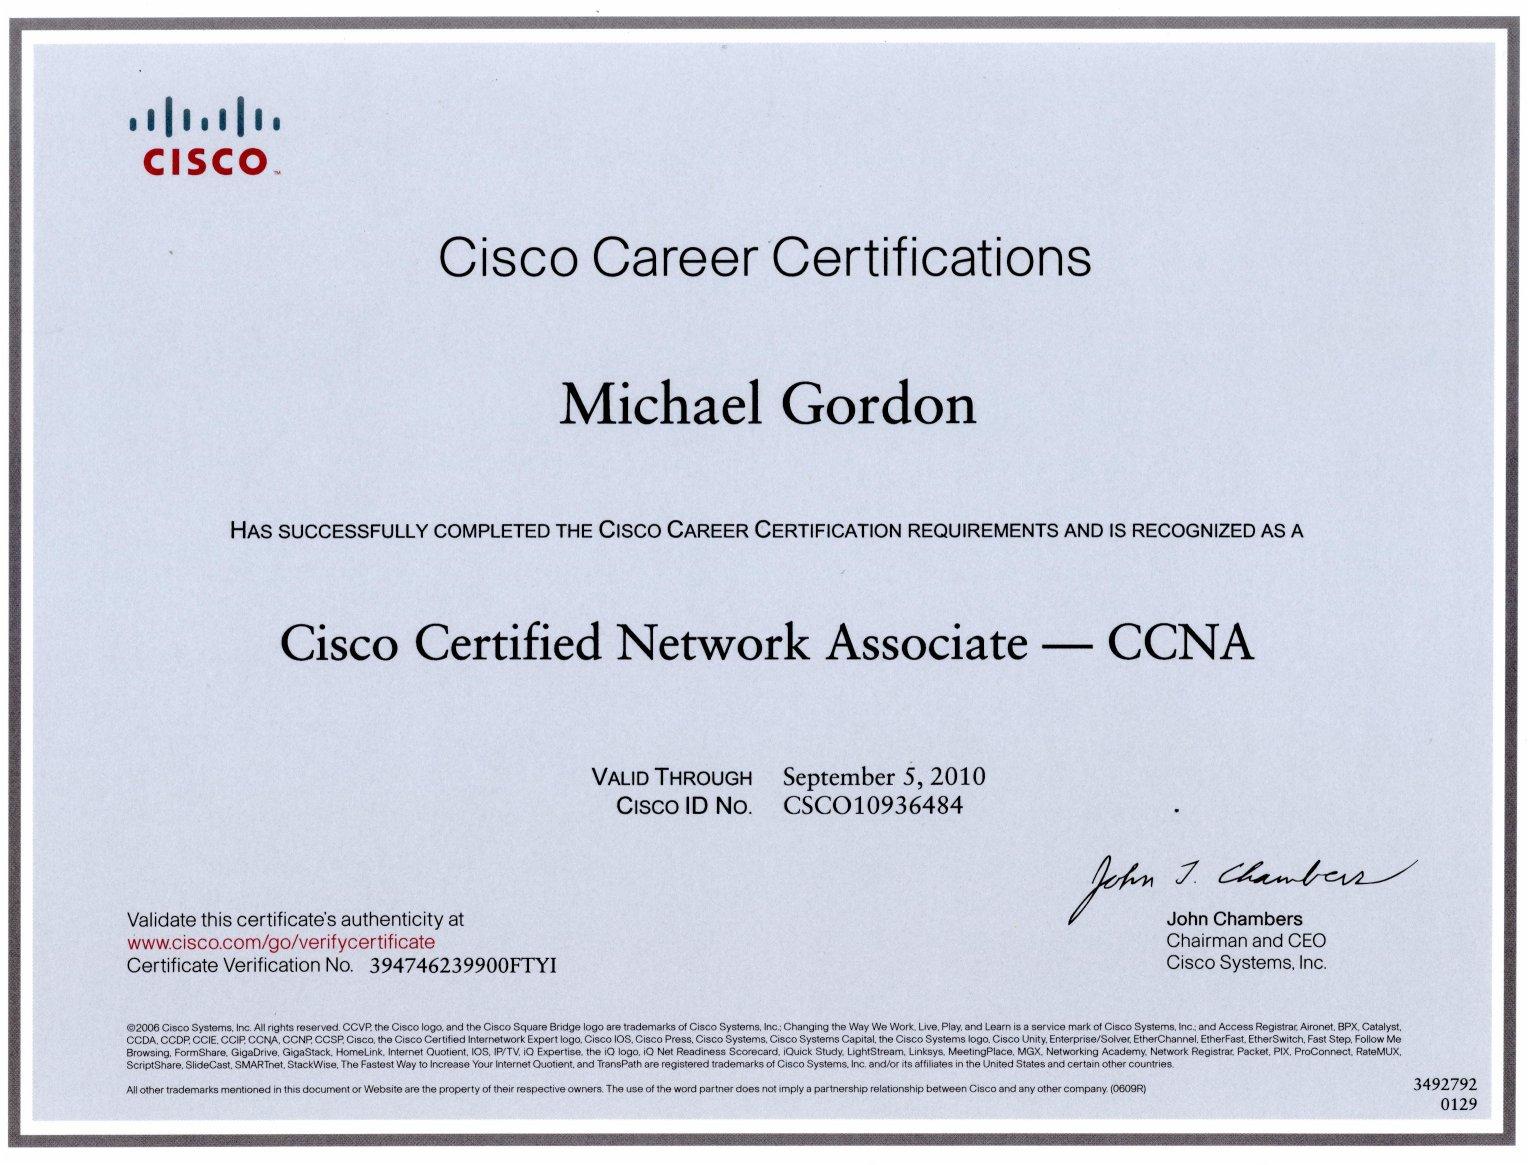 cisco ccna certificate